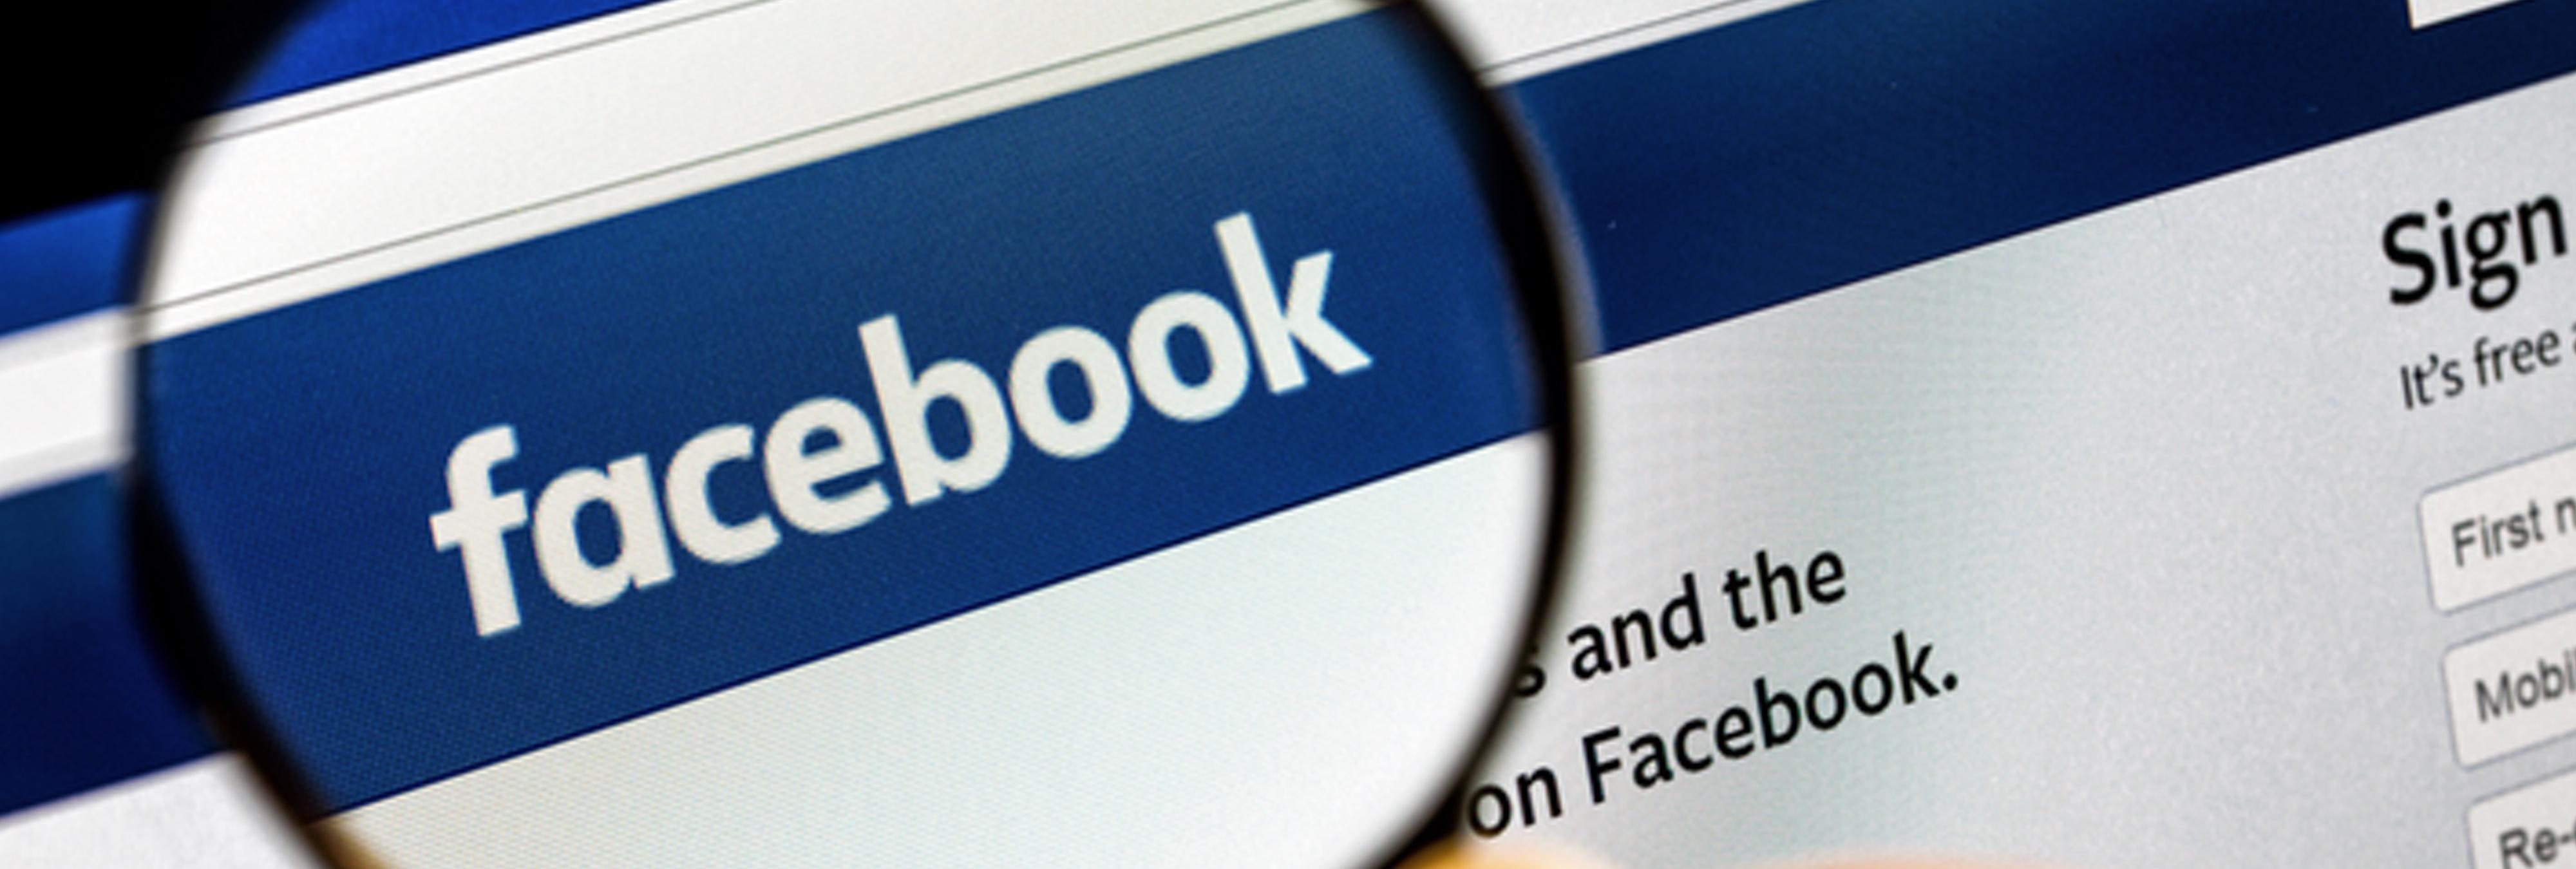 Condenan a Facebook en España por traficar con datos privados de sus usuarios